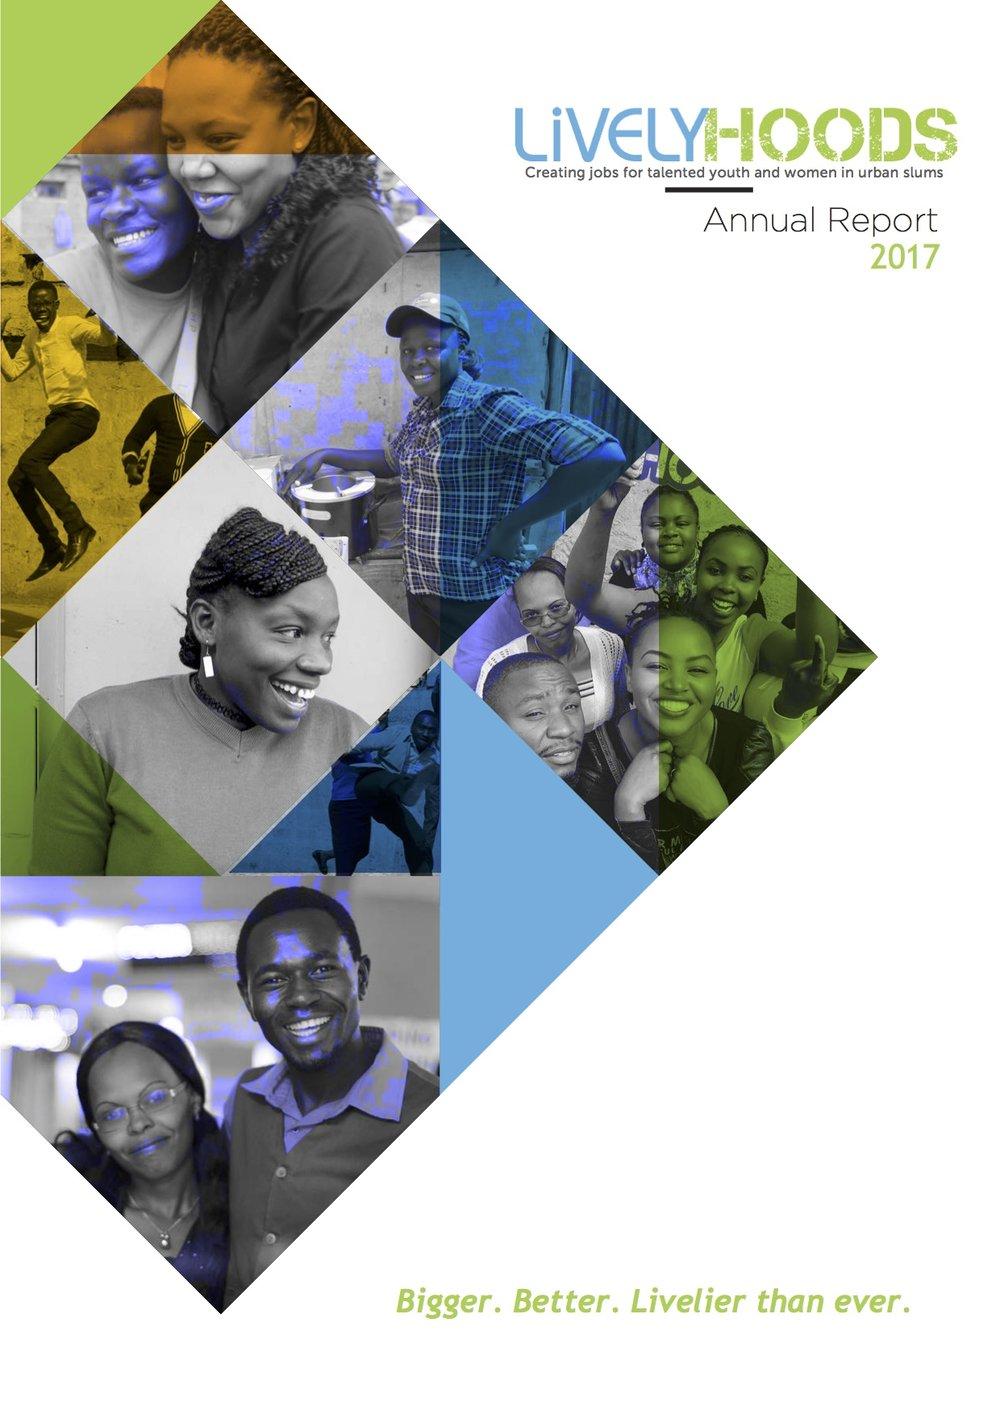 LIVELYHOODS ANNUAL REPORT 2017 web.jpg